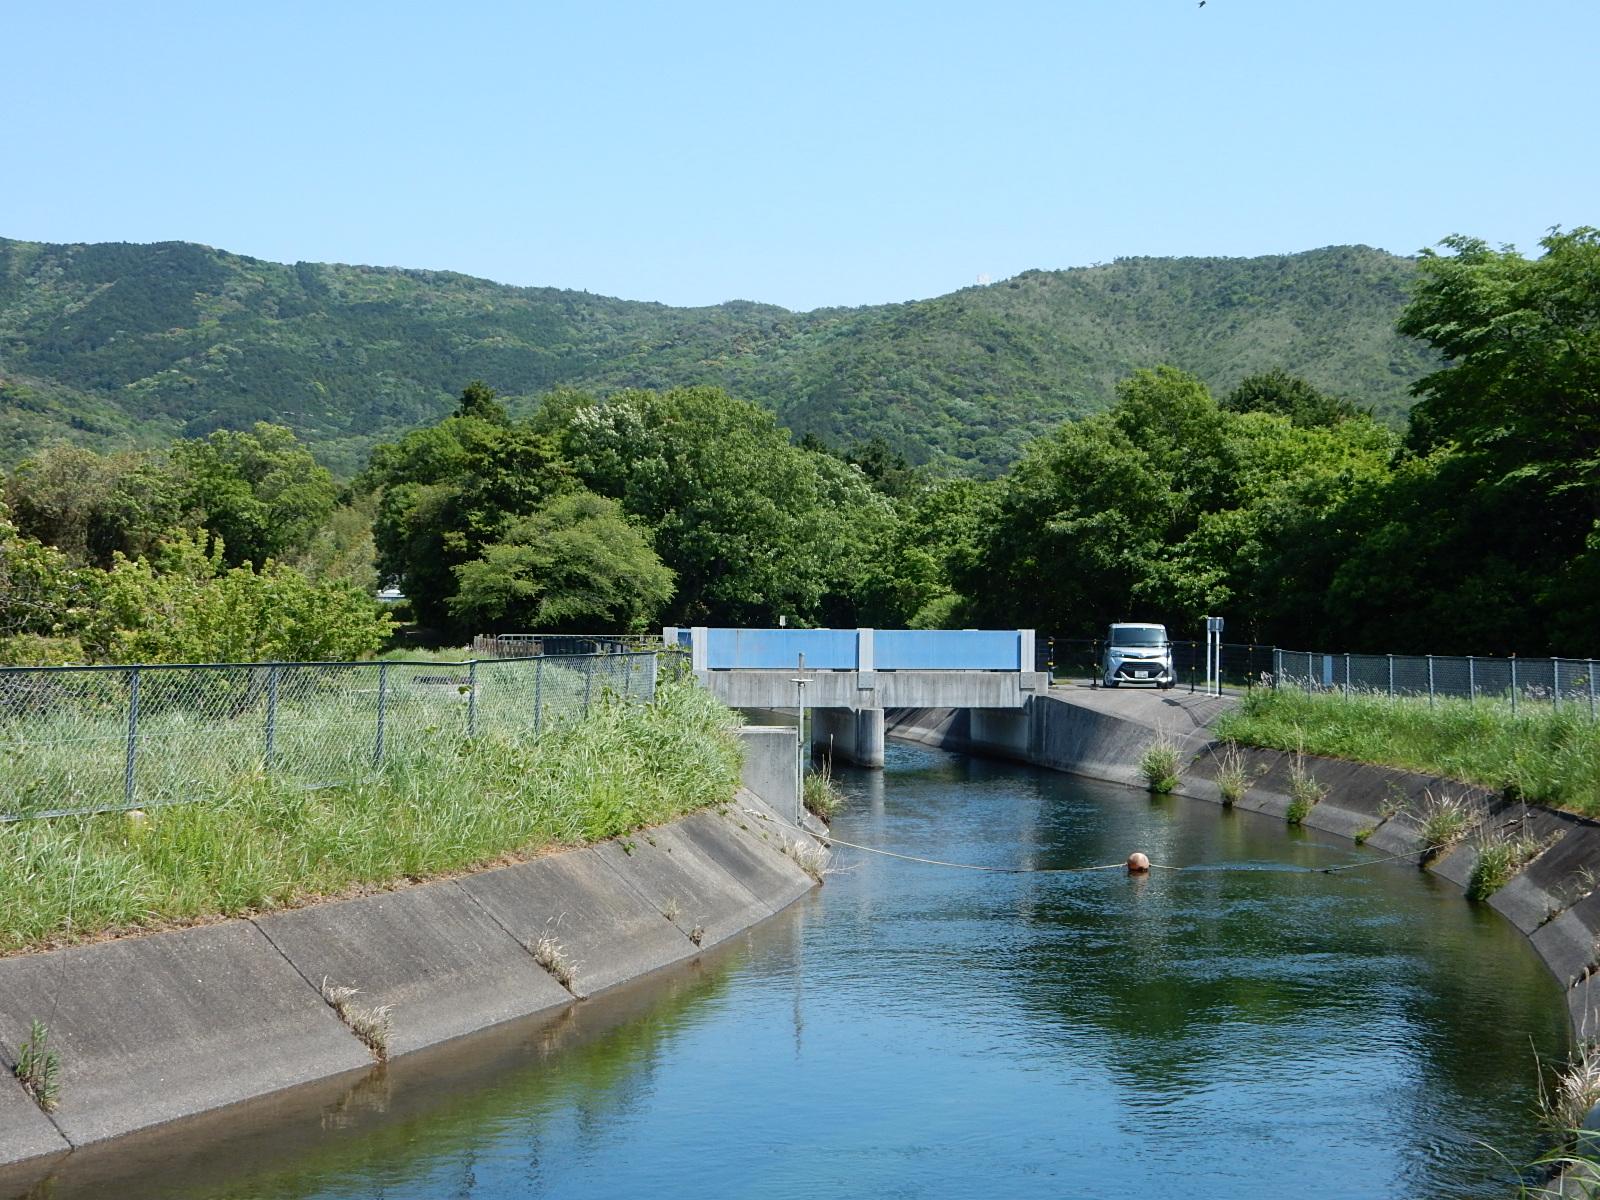 <p>2021年5月撮影<br /> 富岡第1開水路からの新緑の山々</p>